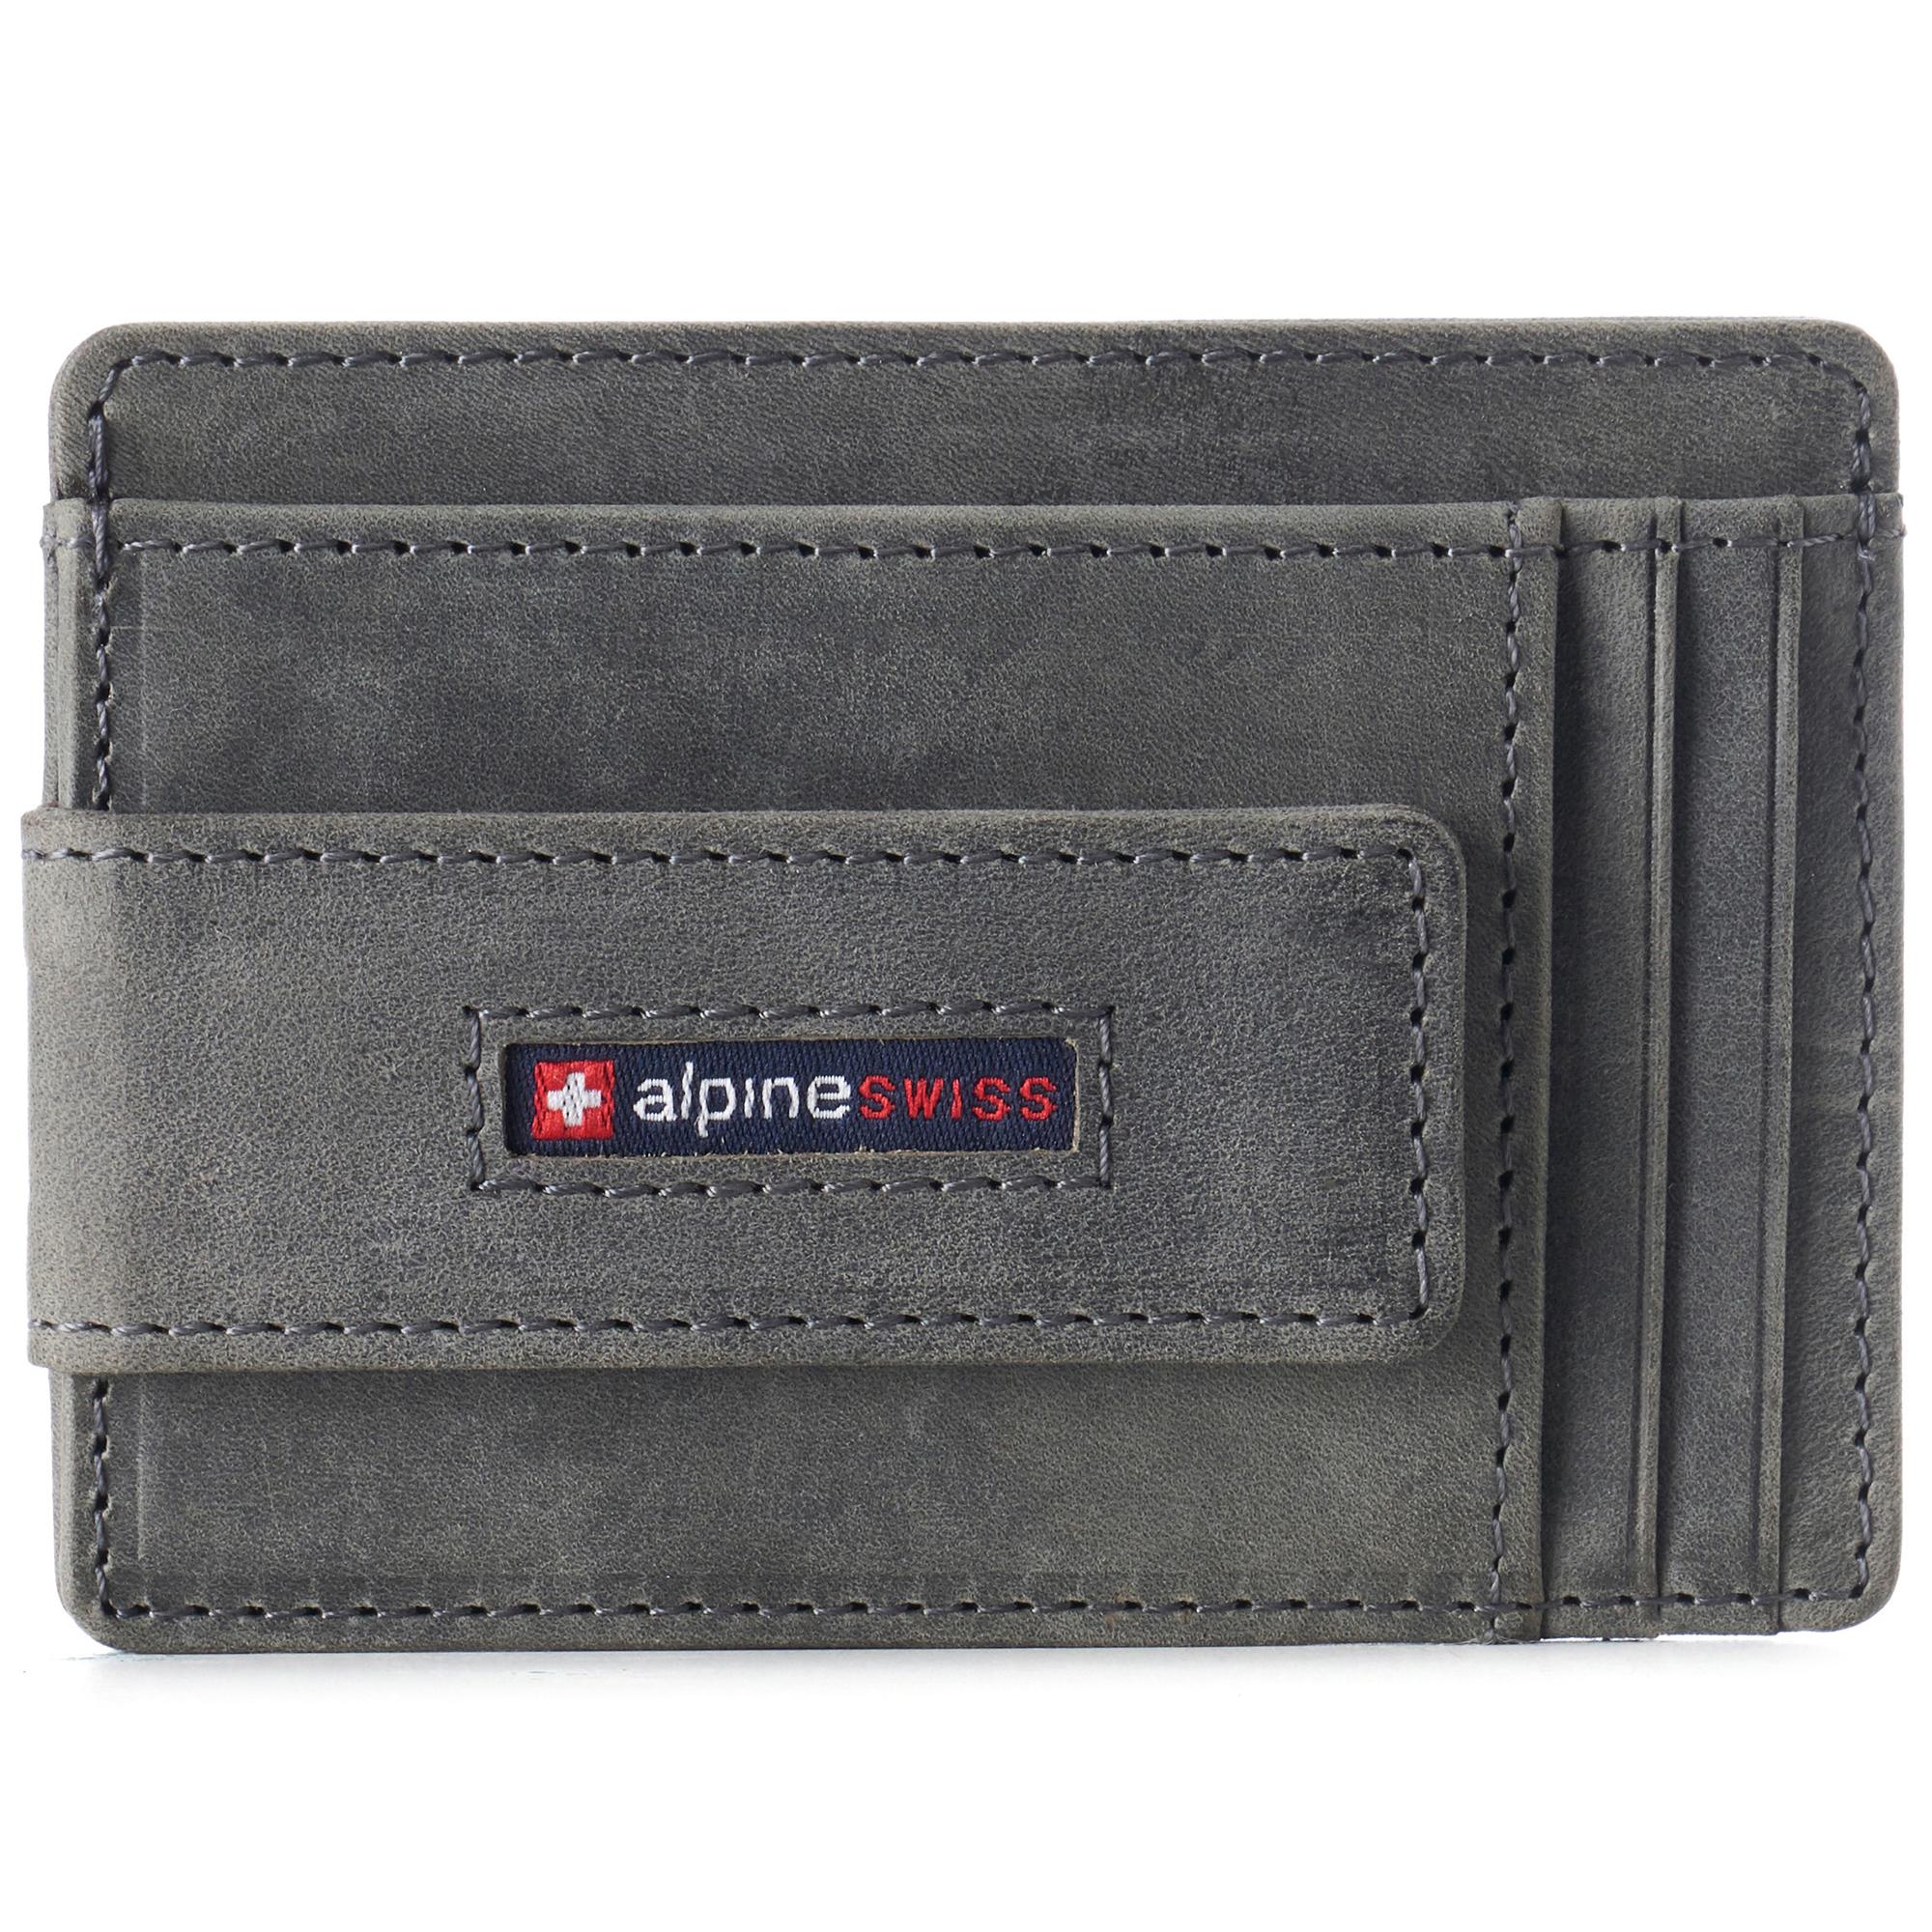 thumbnail 42 - Alpine Swiss Mens RFID Safe Slim Magnetic Money Clip Leather Front Pocket Wallet